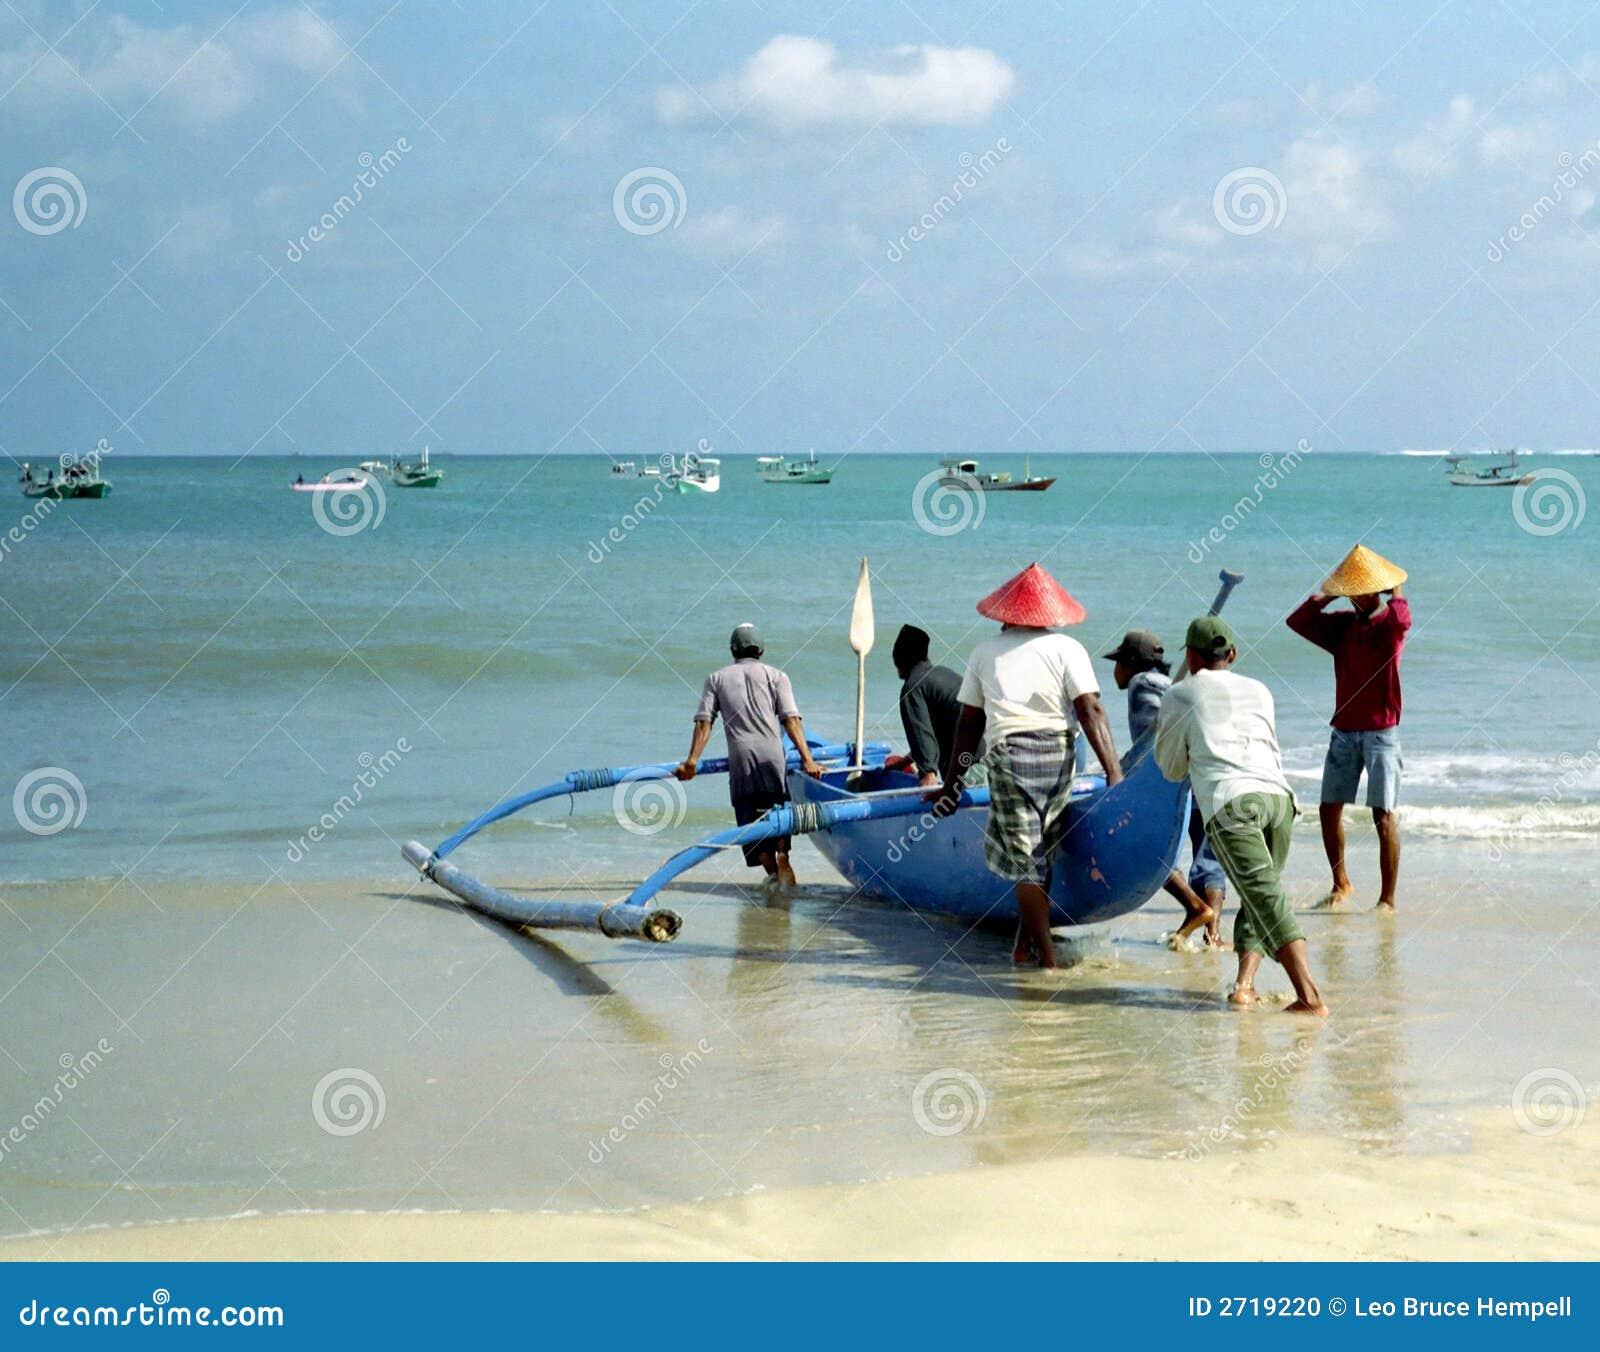 Fisherman, Bali Indonesia.